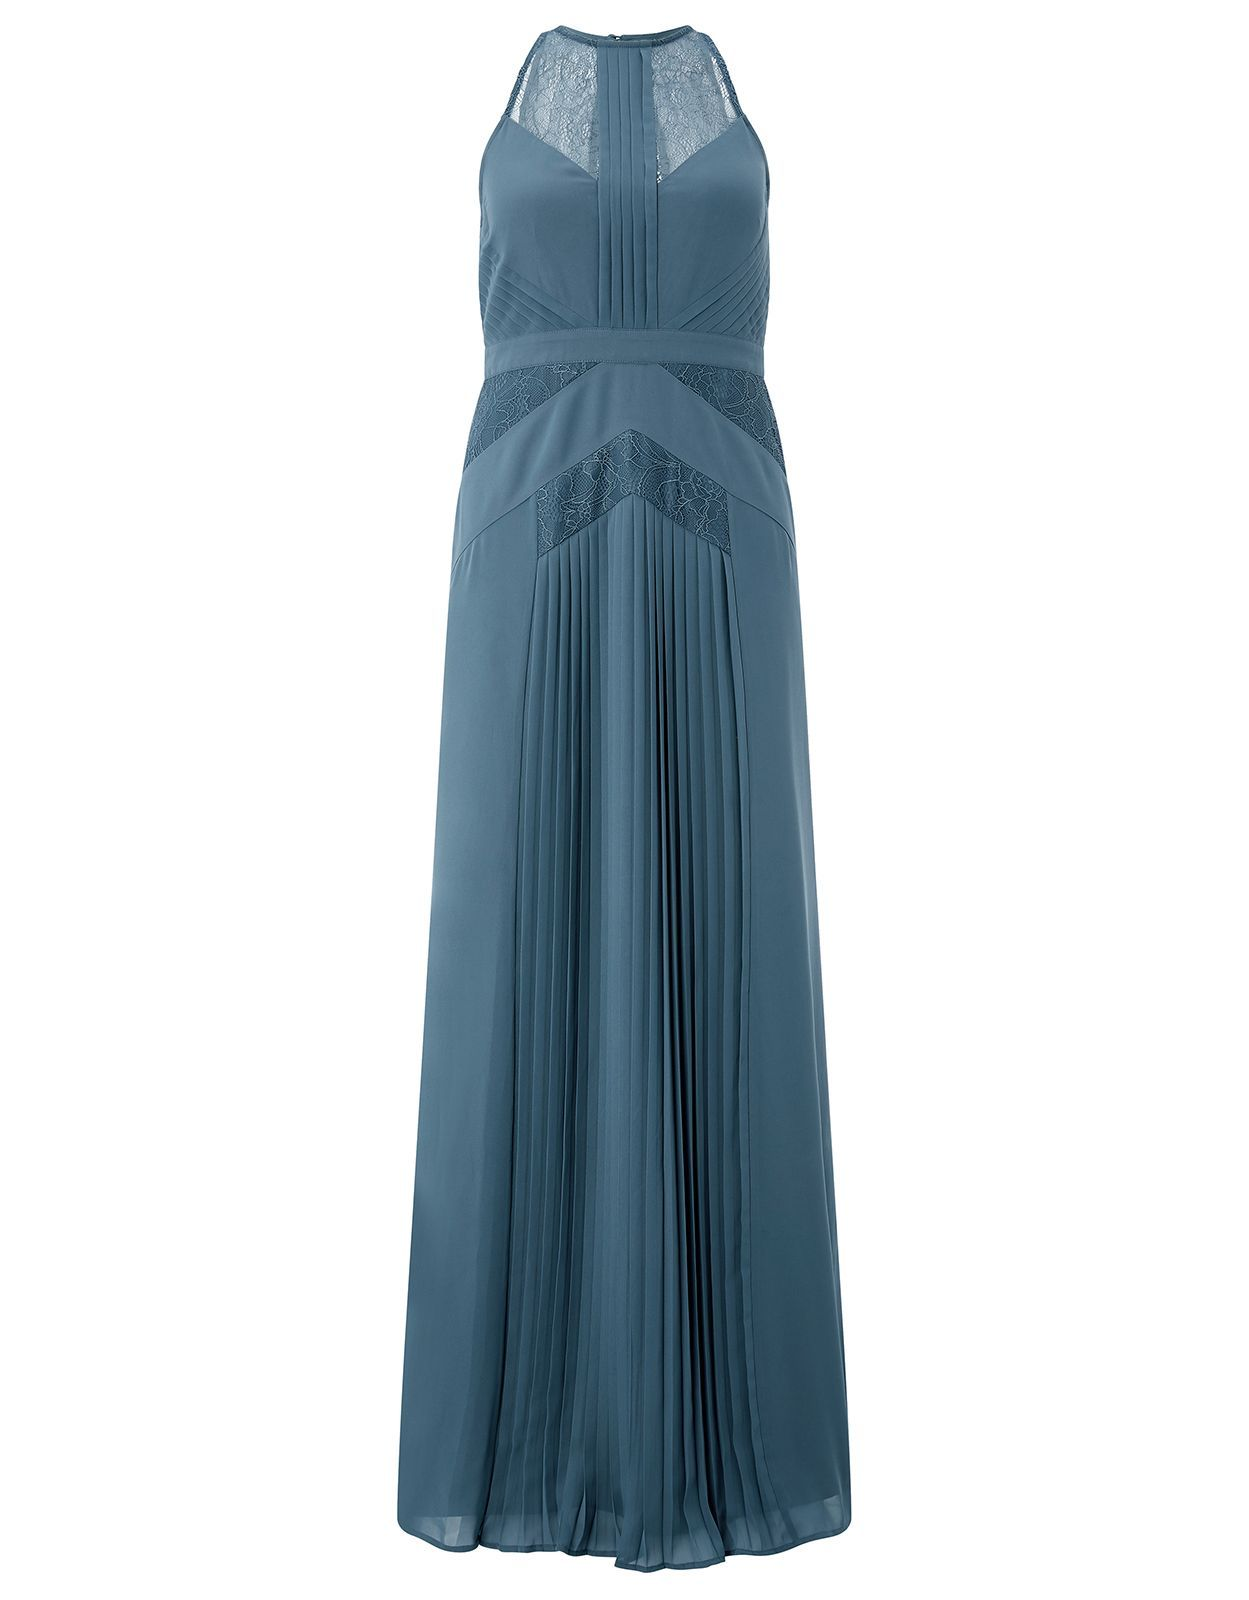 House of Fraser - Monsoon Aminta Maxi Dress, Blue - https ...